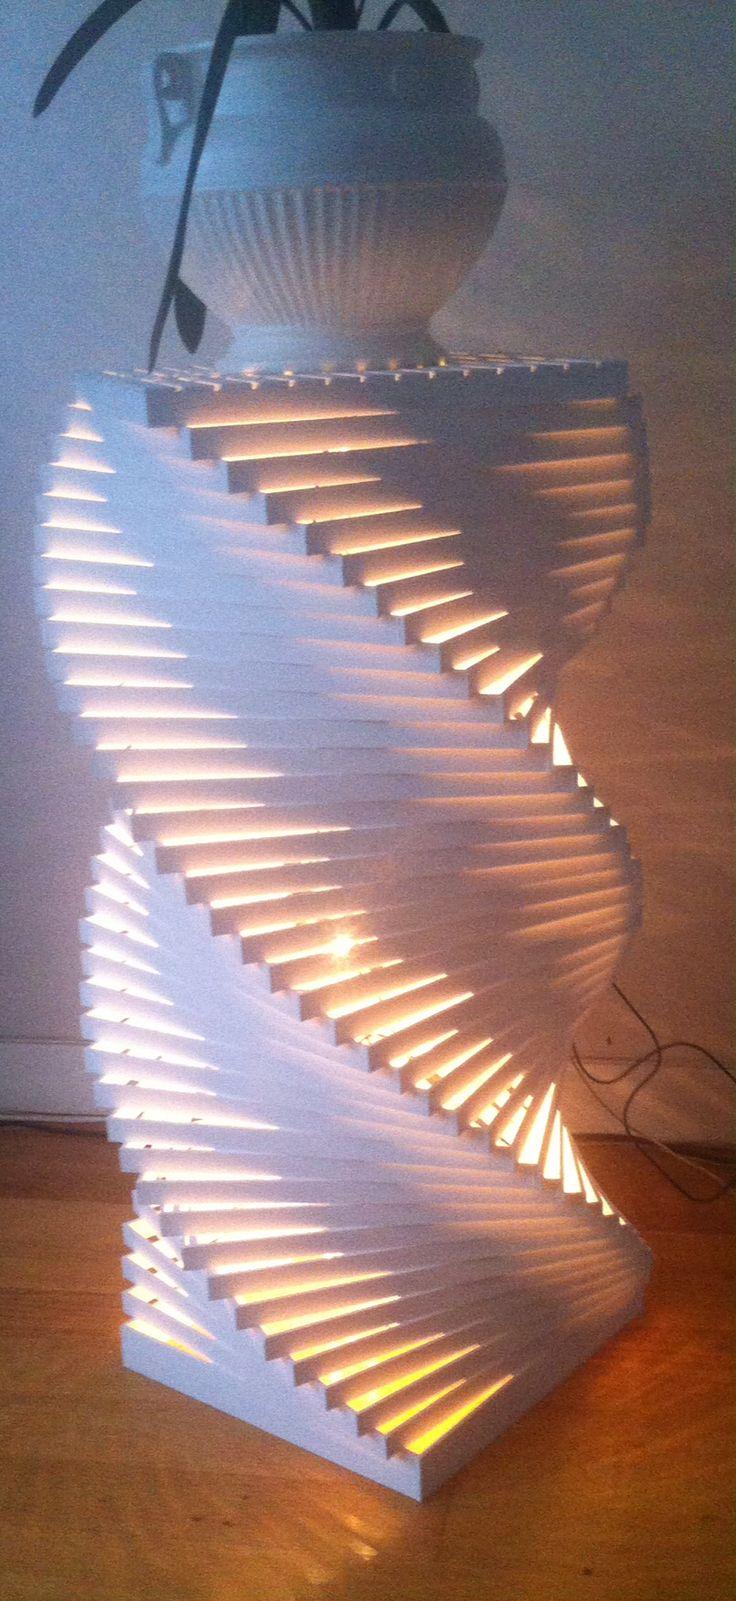 Woodstick lamp